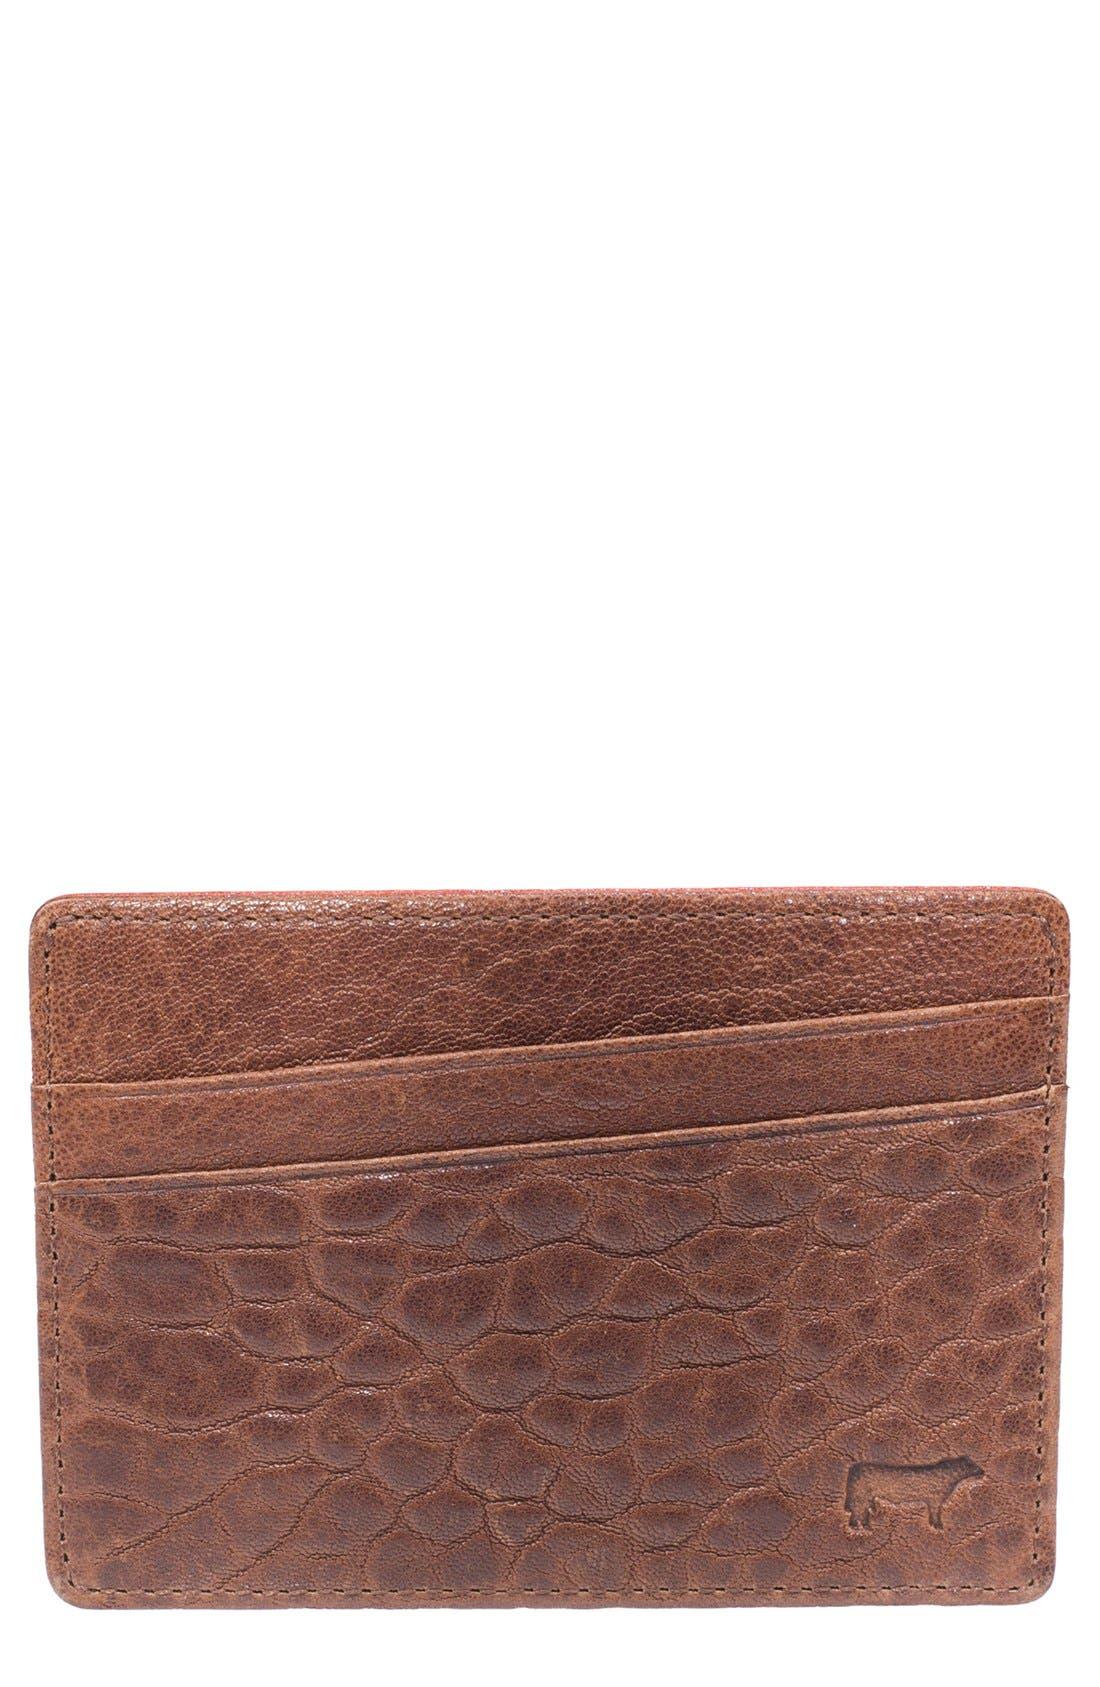 'Quip' Leather Card Case,                         Main,                         color, Cognac/ Rust